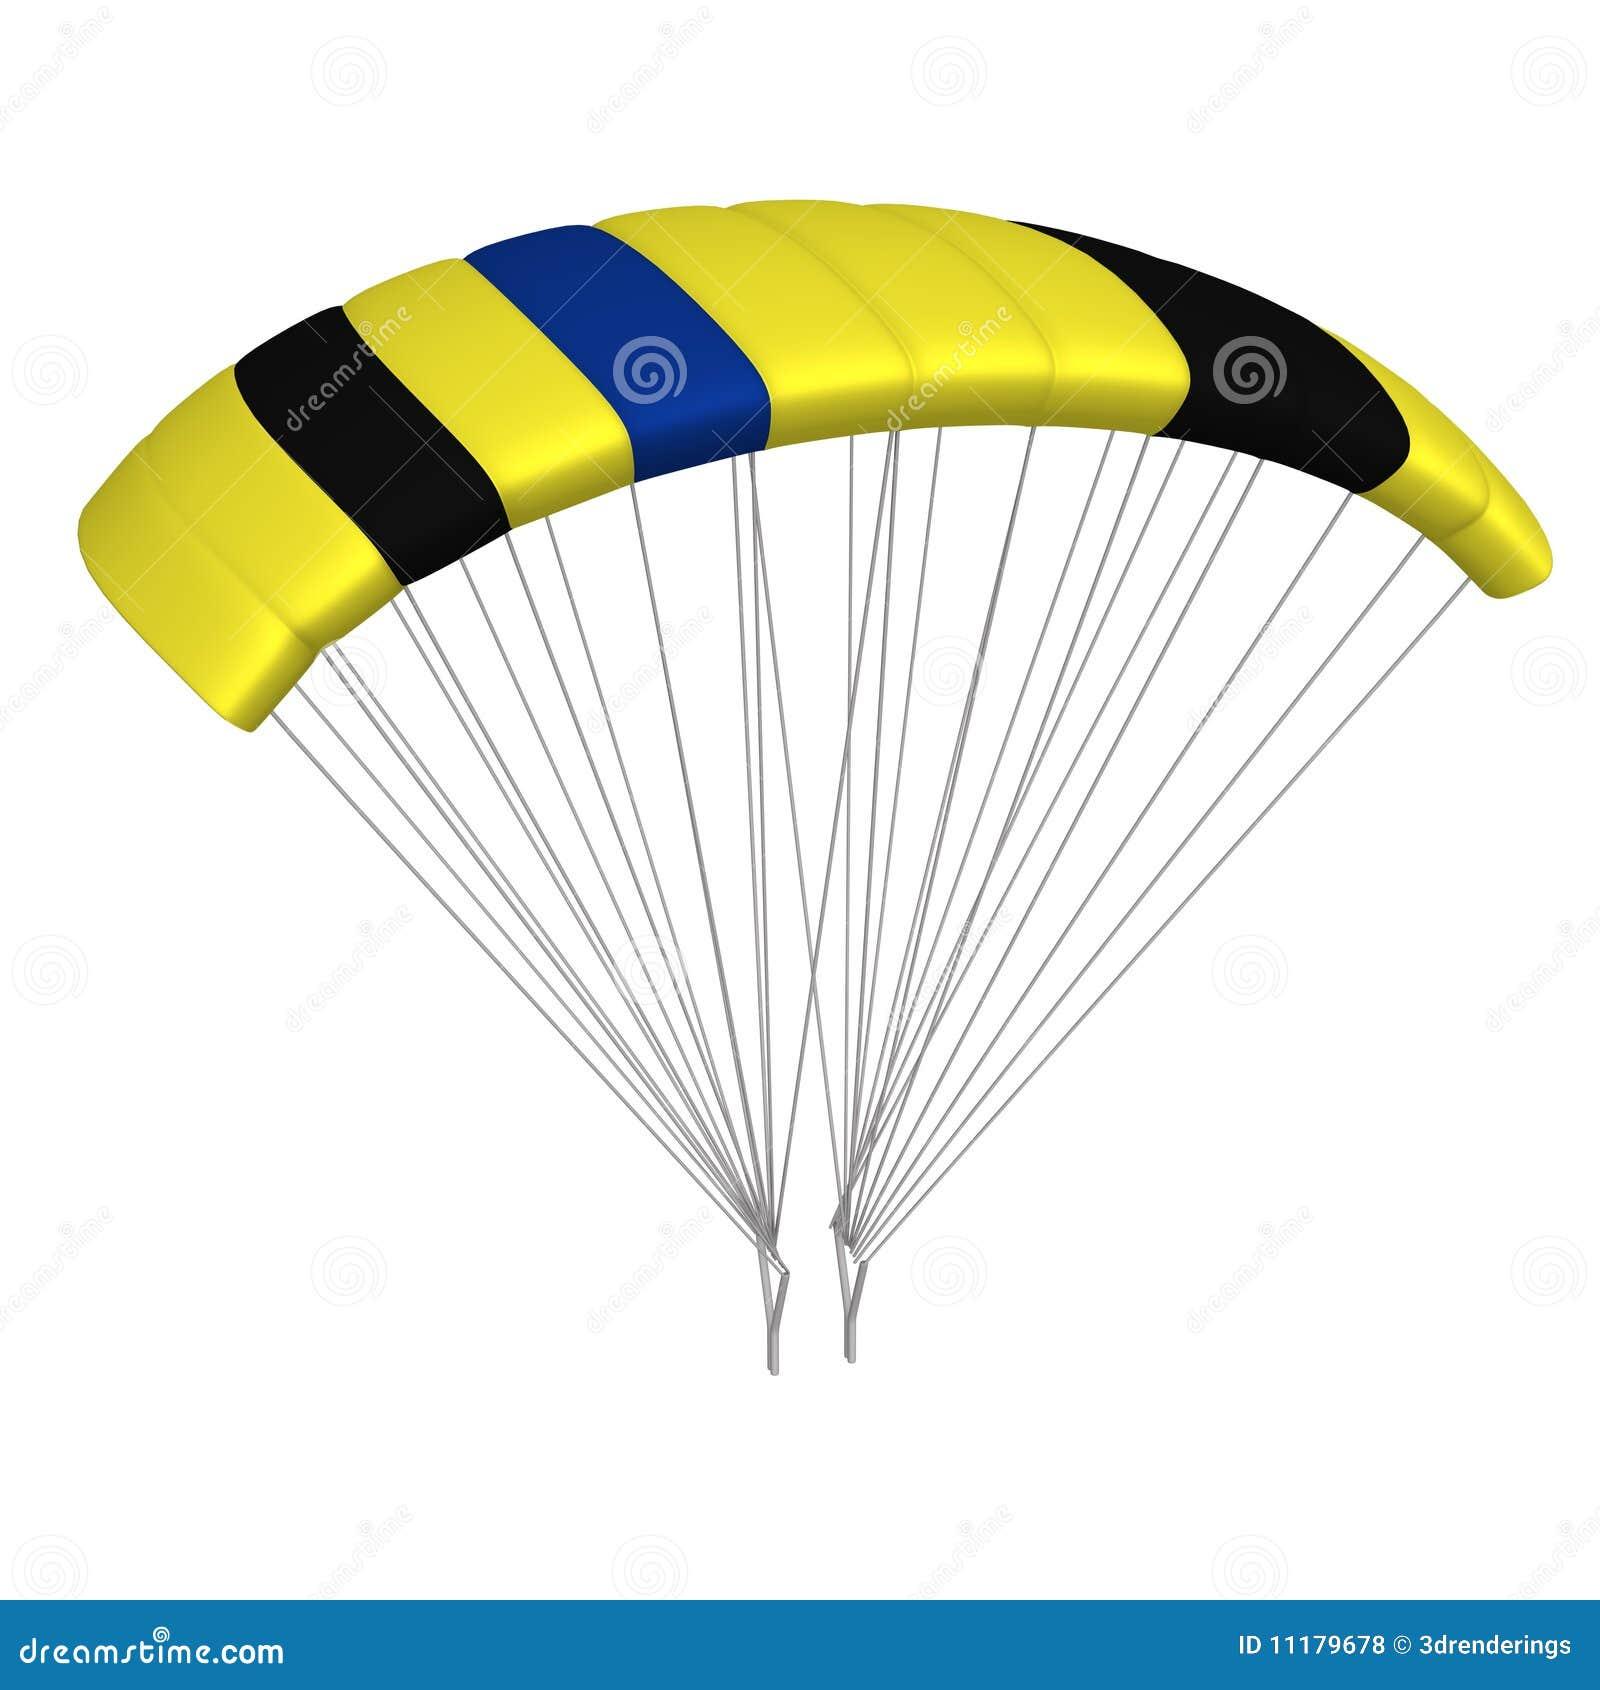 Design A Parachute Game